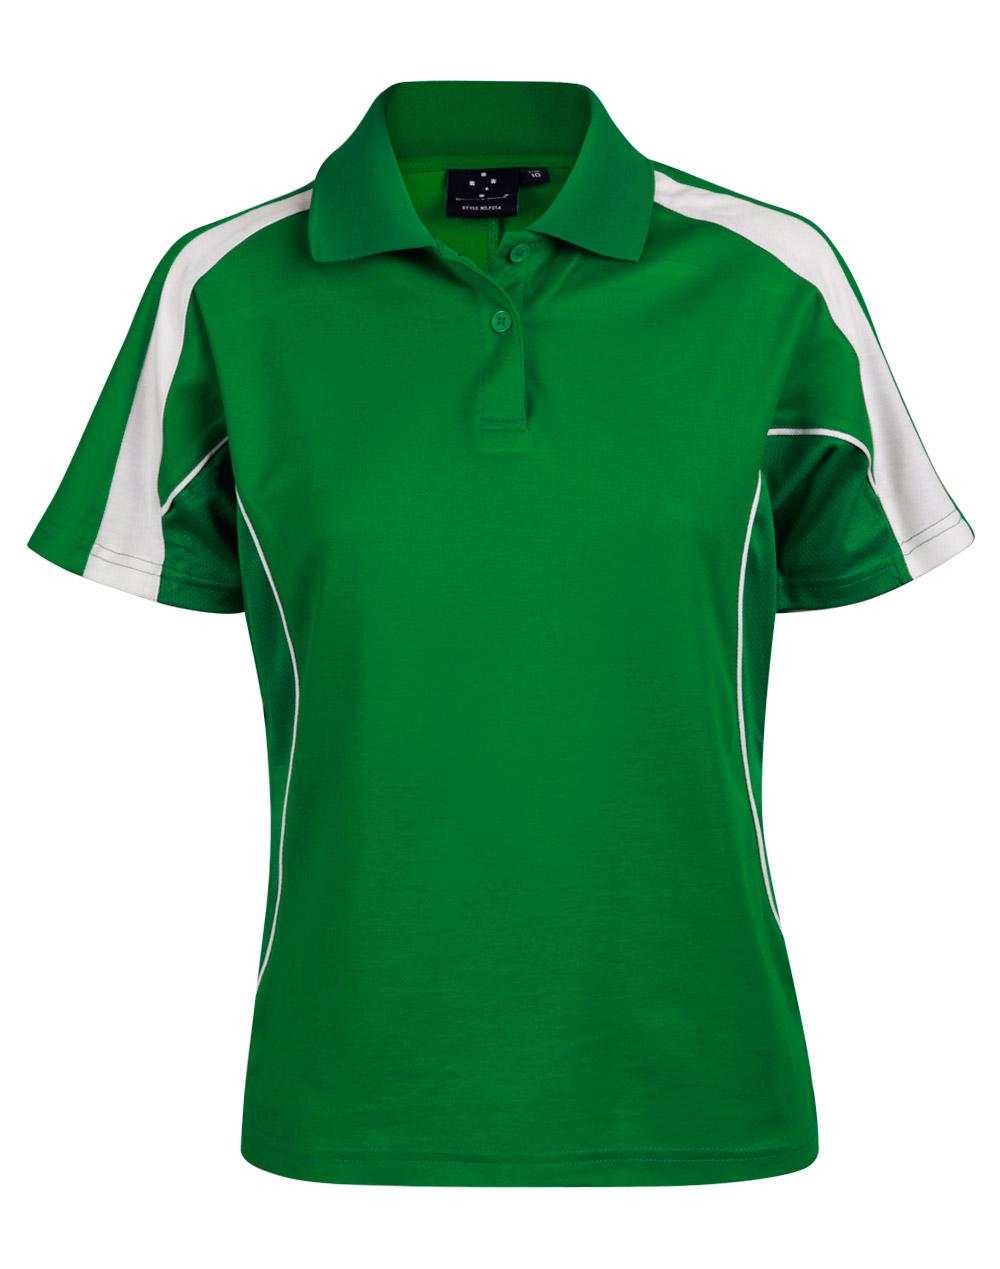 Emerald Green.White